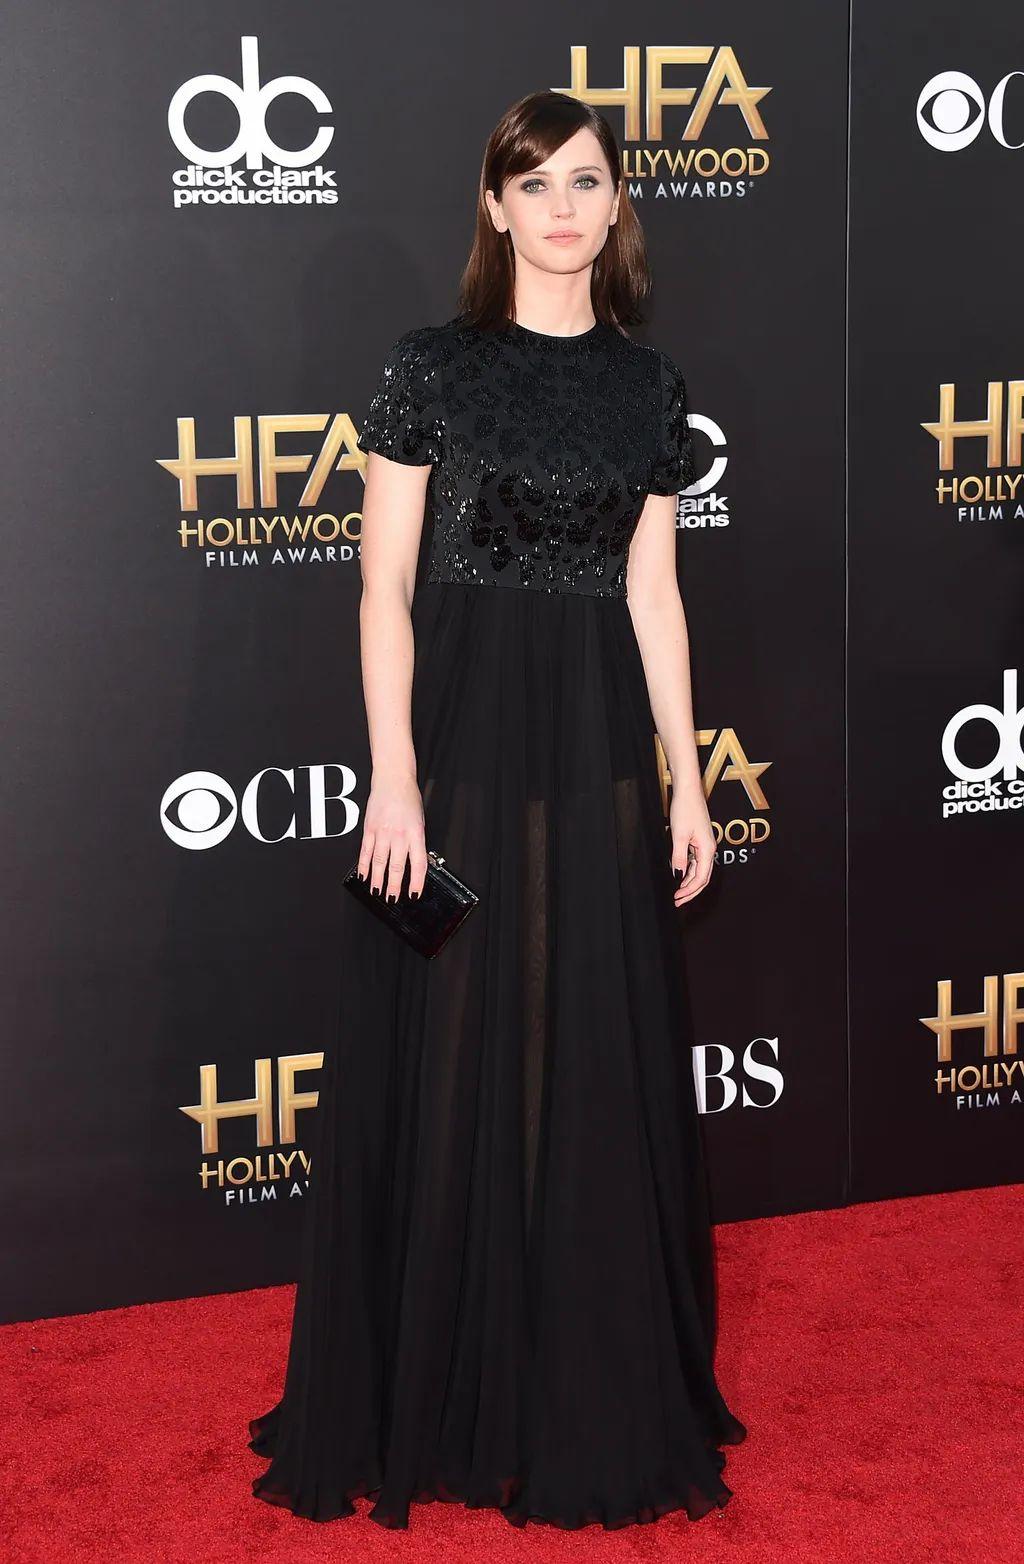 Felicity jones black dress hollywood film awards 2014